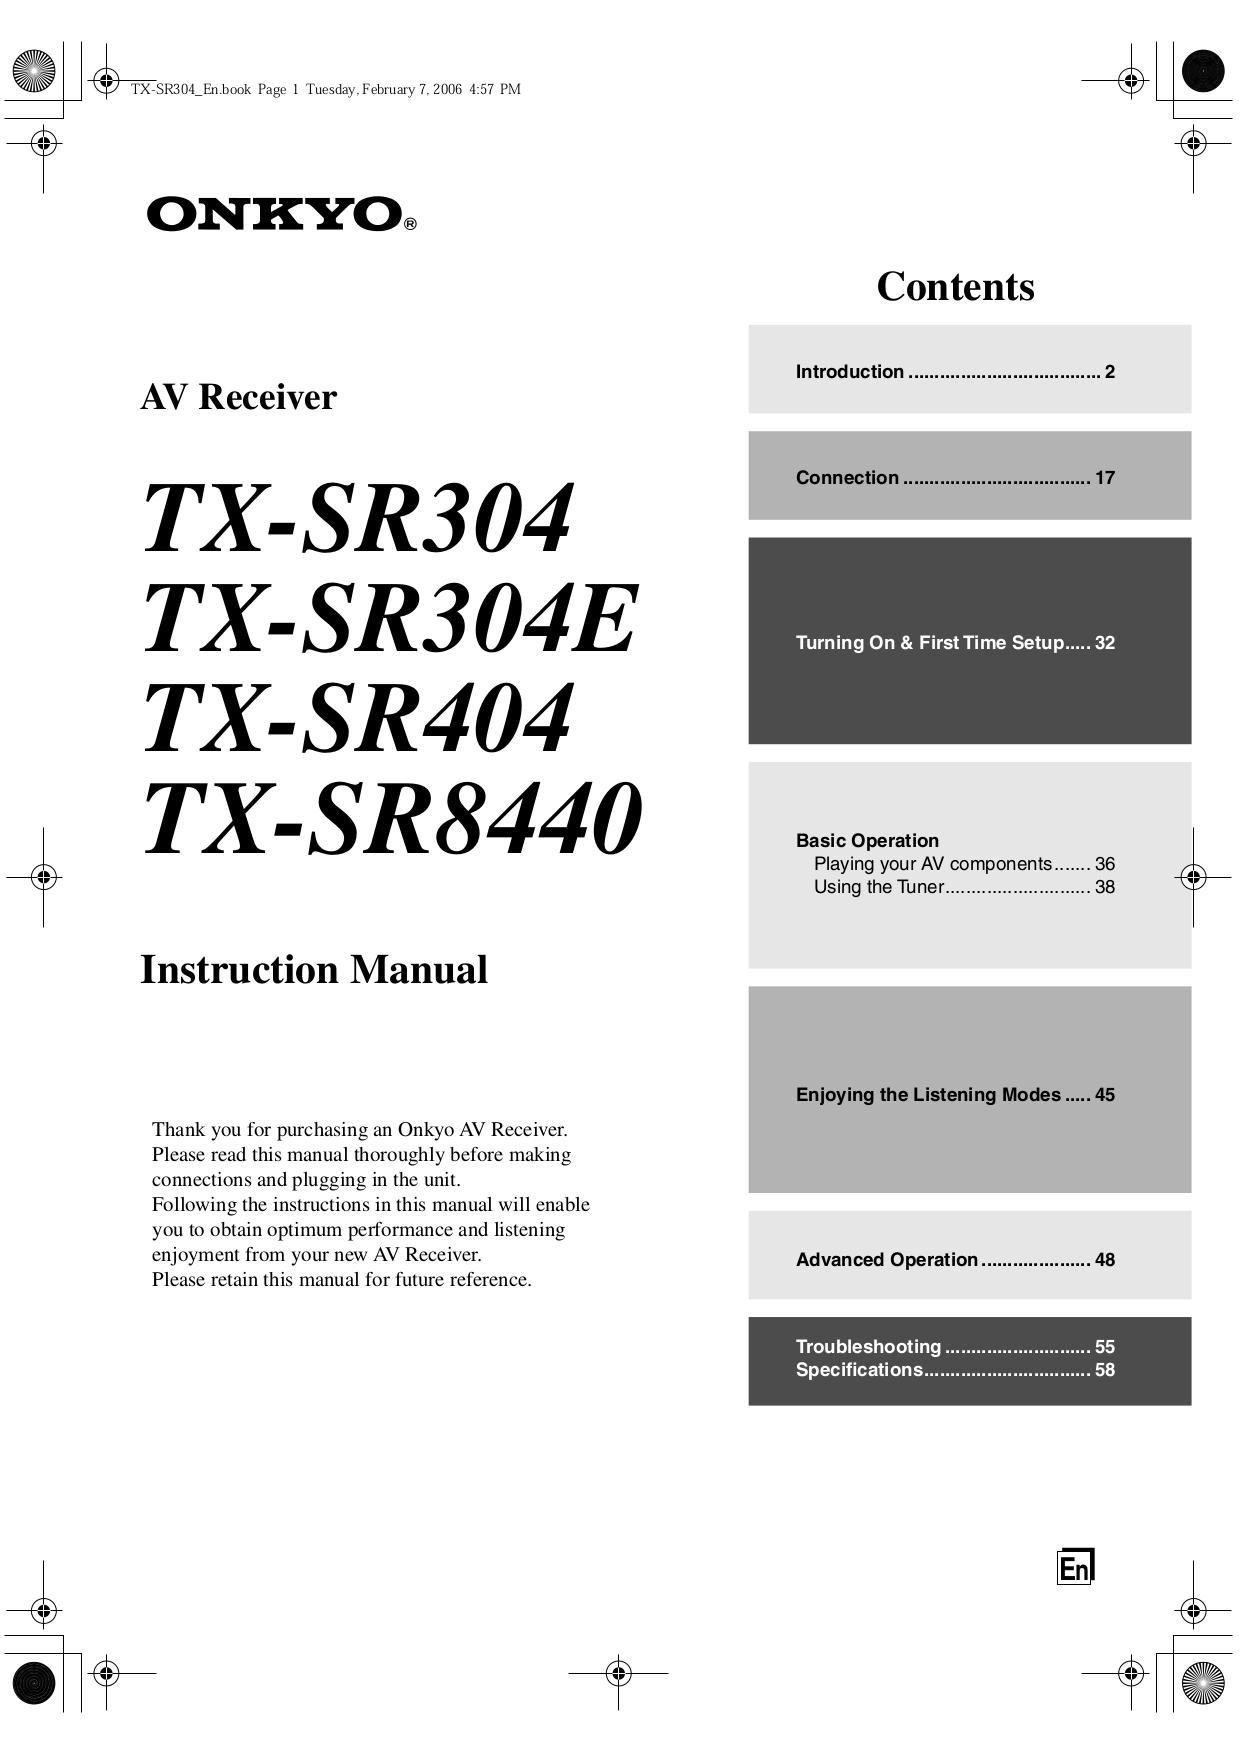 Mcculloch mt270x instruction manual ebook array tx sr304 manual ebook rh tx sr304 manual ebook argodata us fandeluxe Gallery